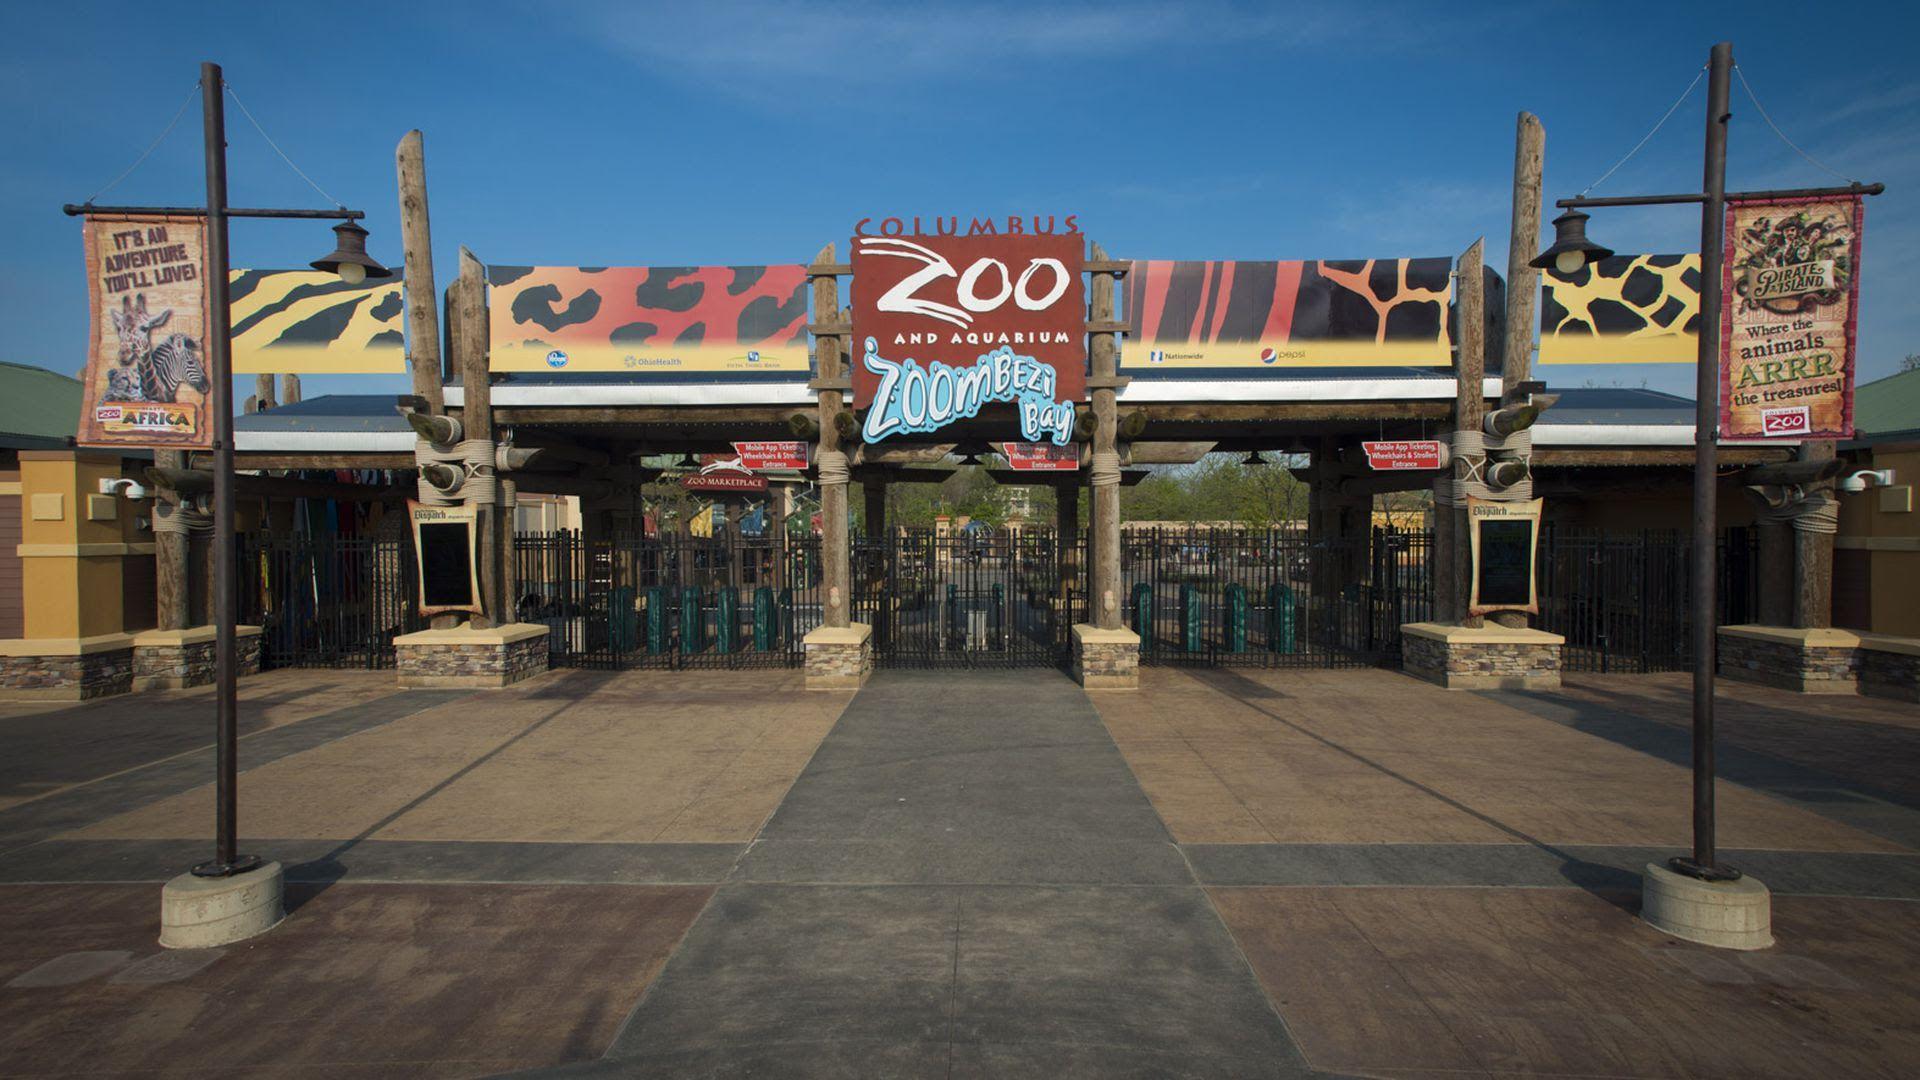 The Columbus Zoo and Aquarium entrance.